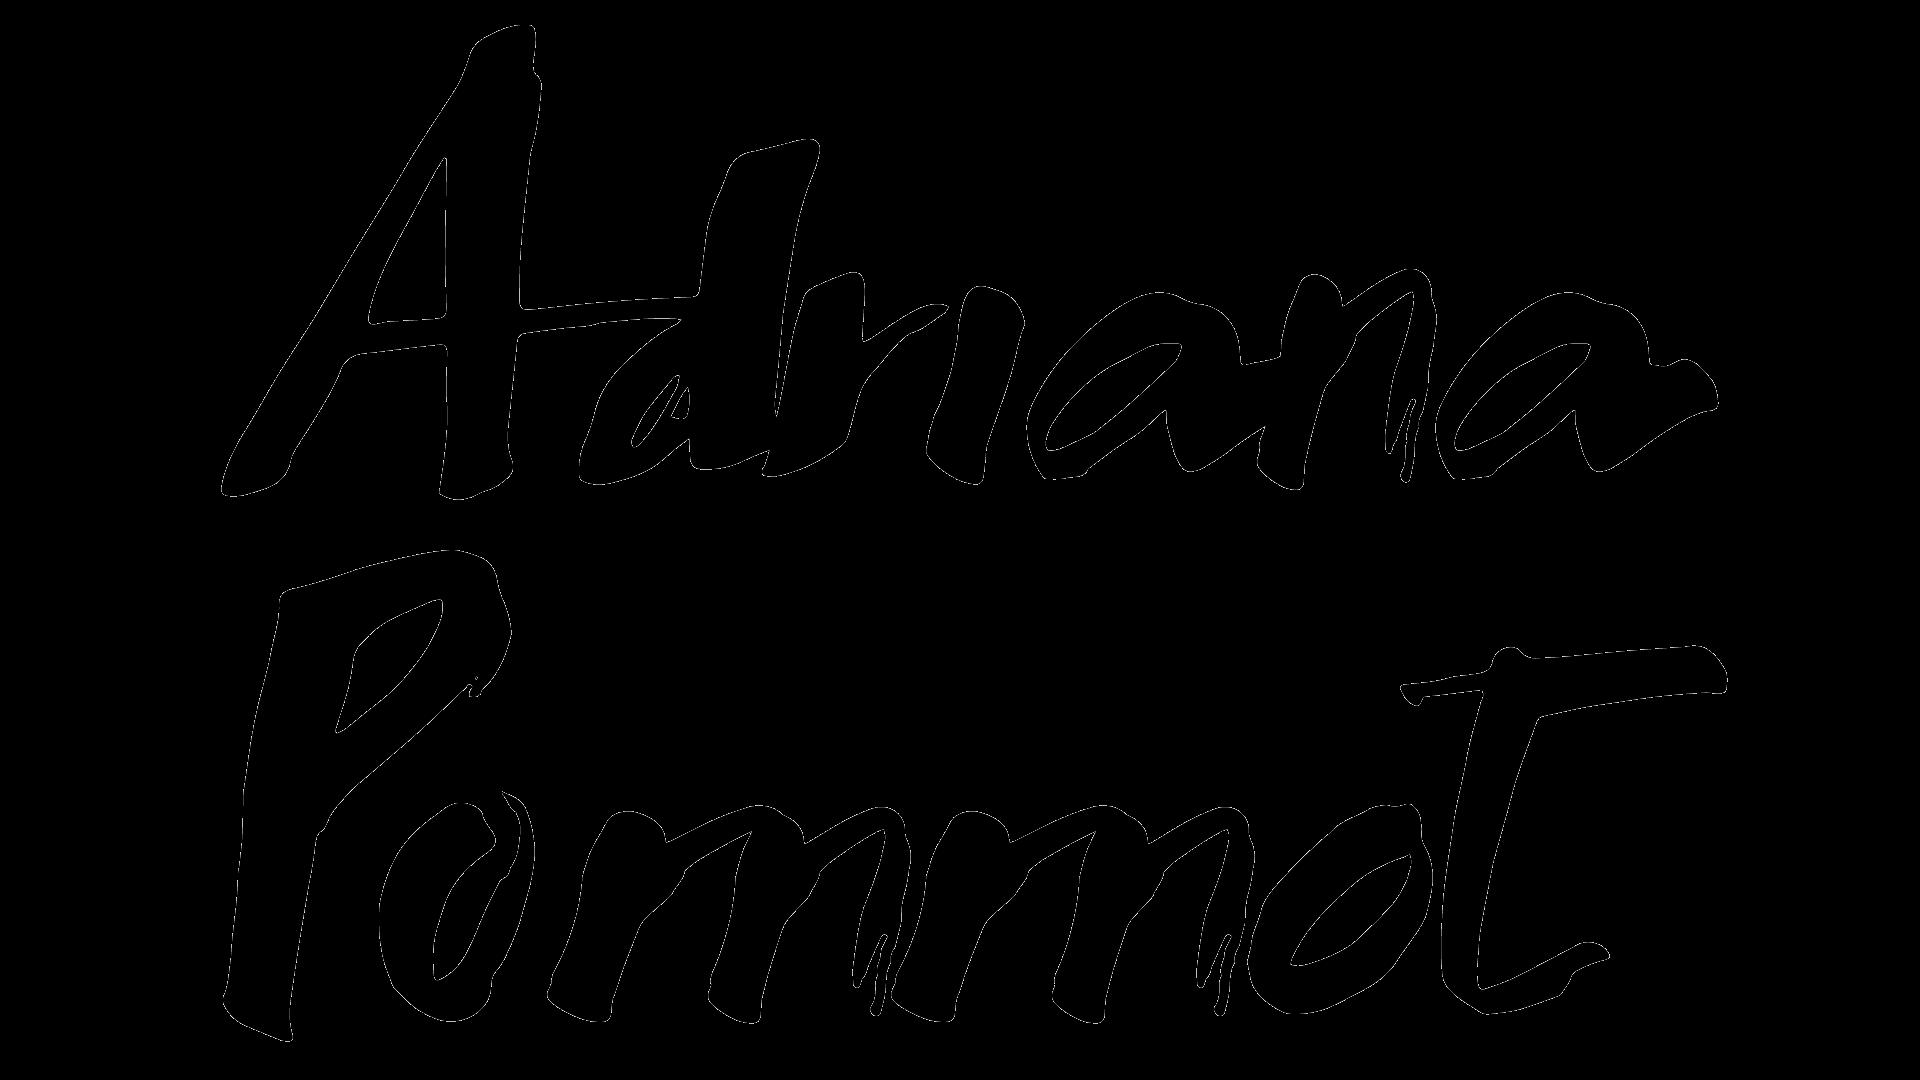 adriana pommot